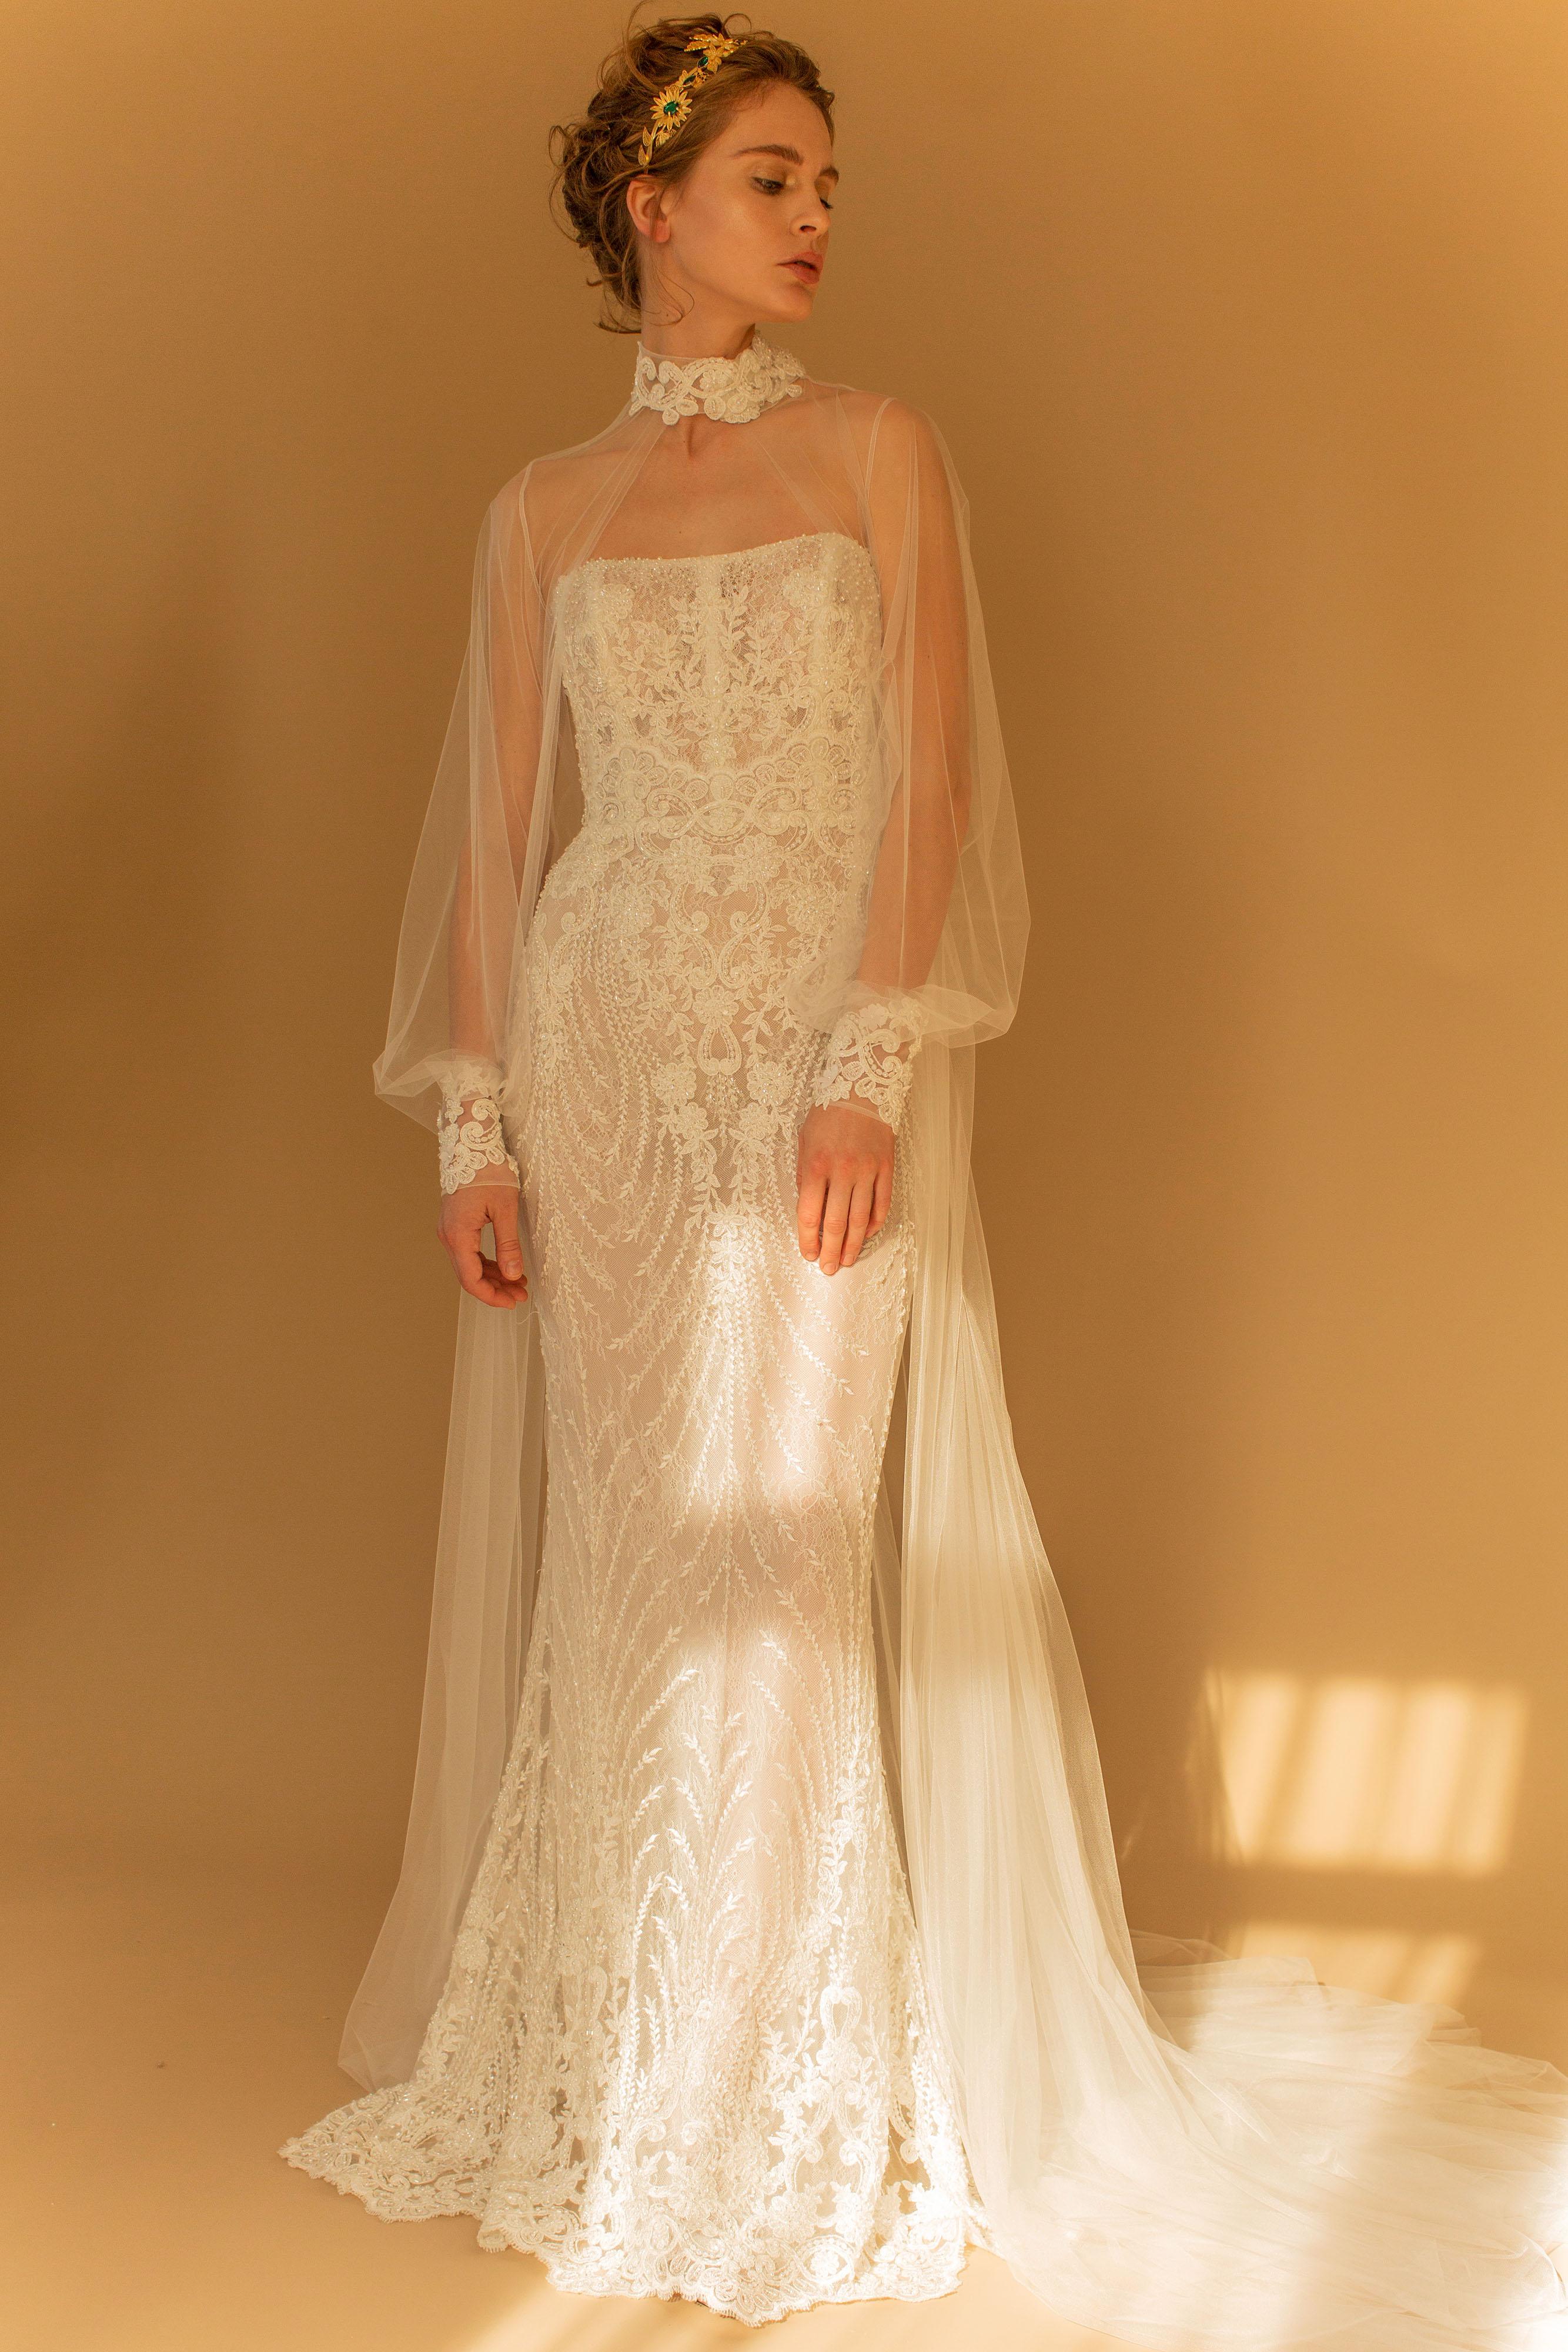 francesca miranda wedding dress fall 2018 illustion long sleeves embellished